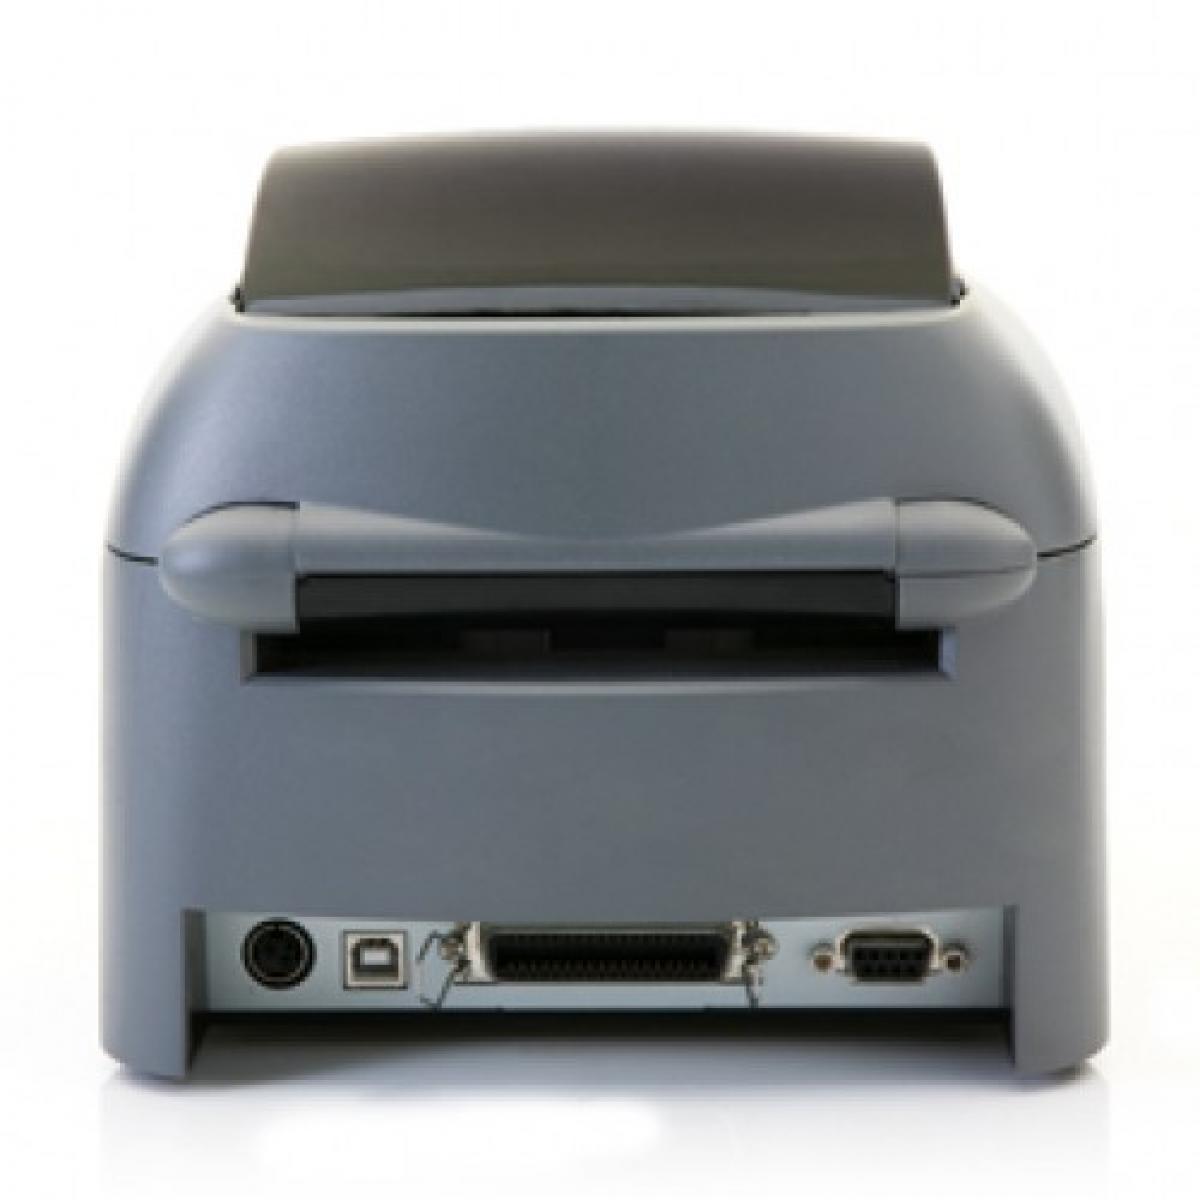 lukhan printer lk-t21 driver